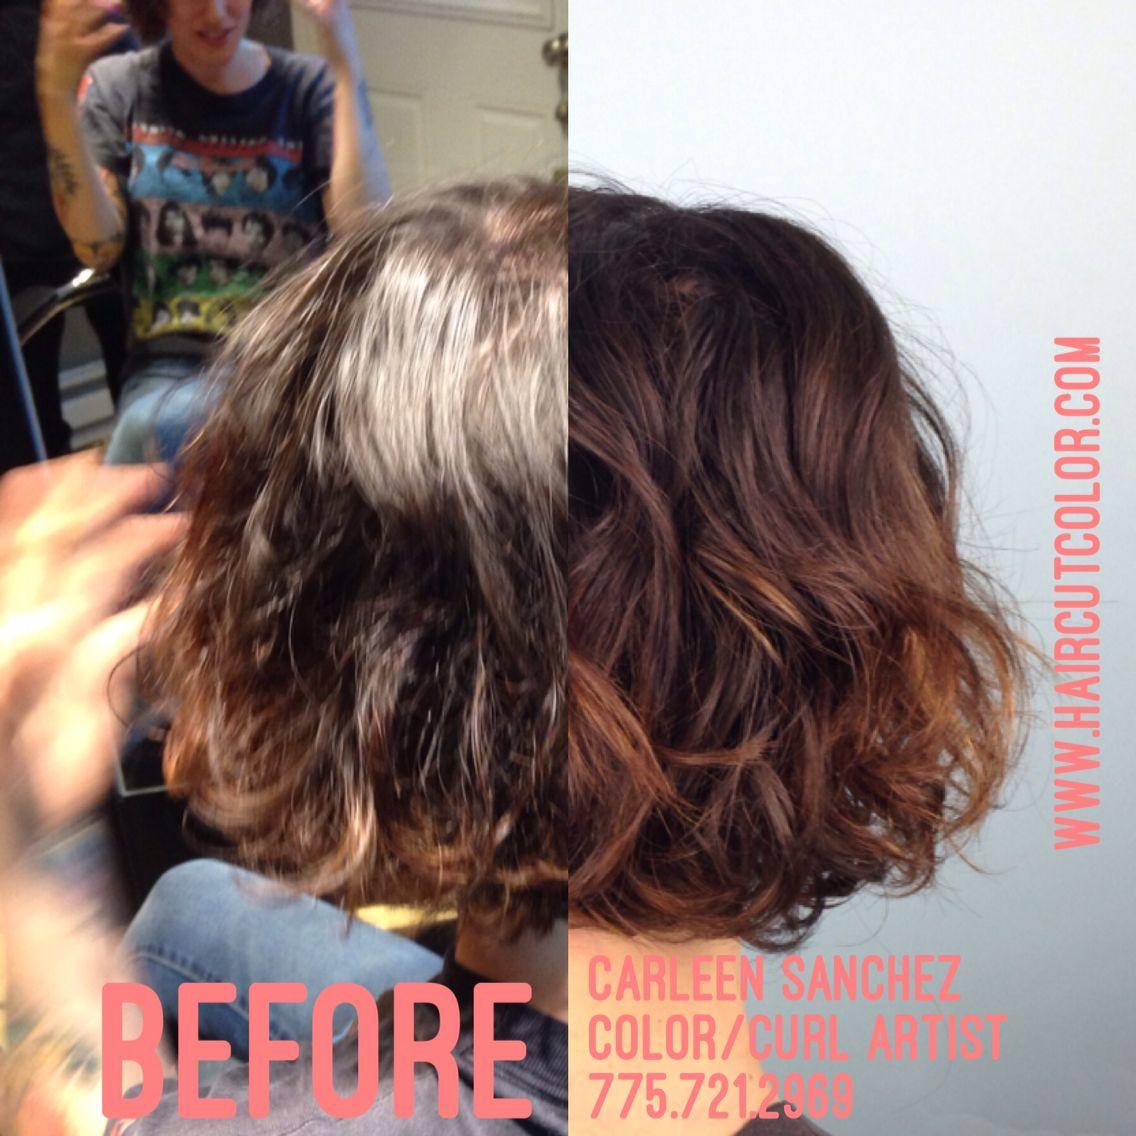 Curly wavy hair artistry by Carleen Sanchez, soft Balayage